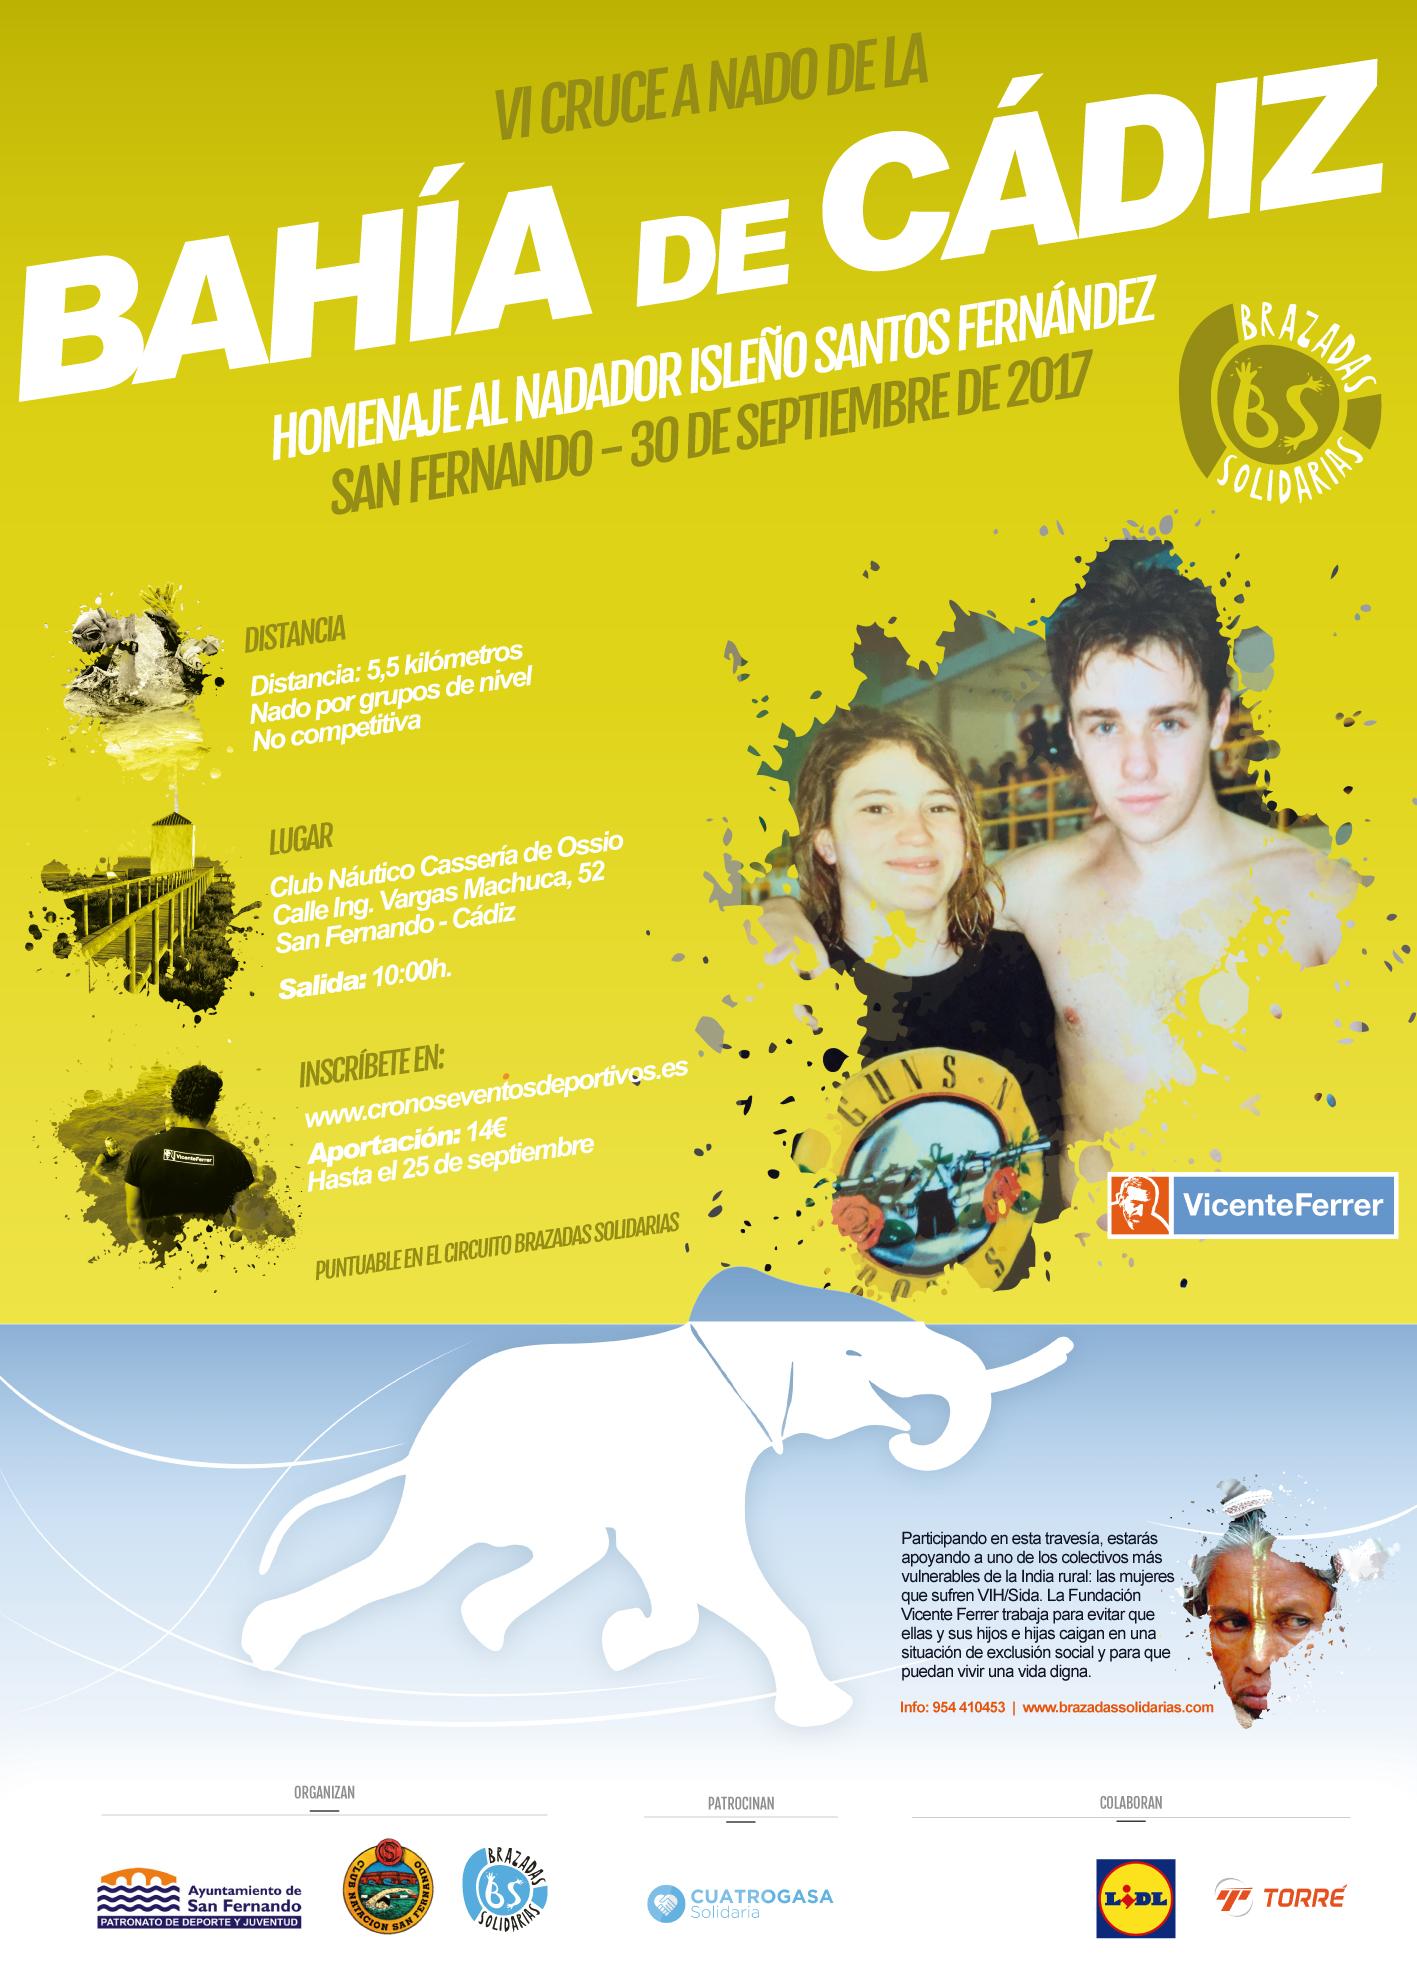 Cruce a nado de la Bahía de Cádiz